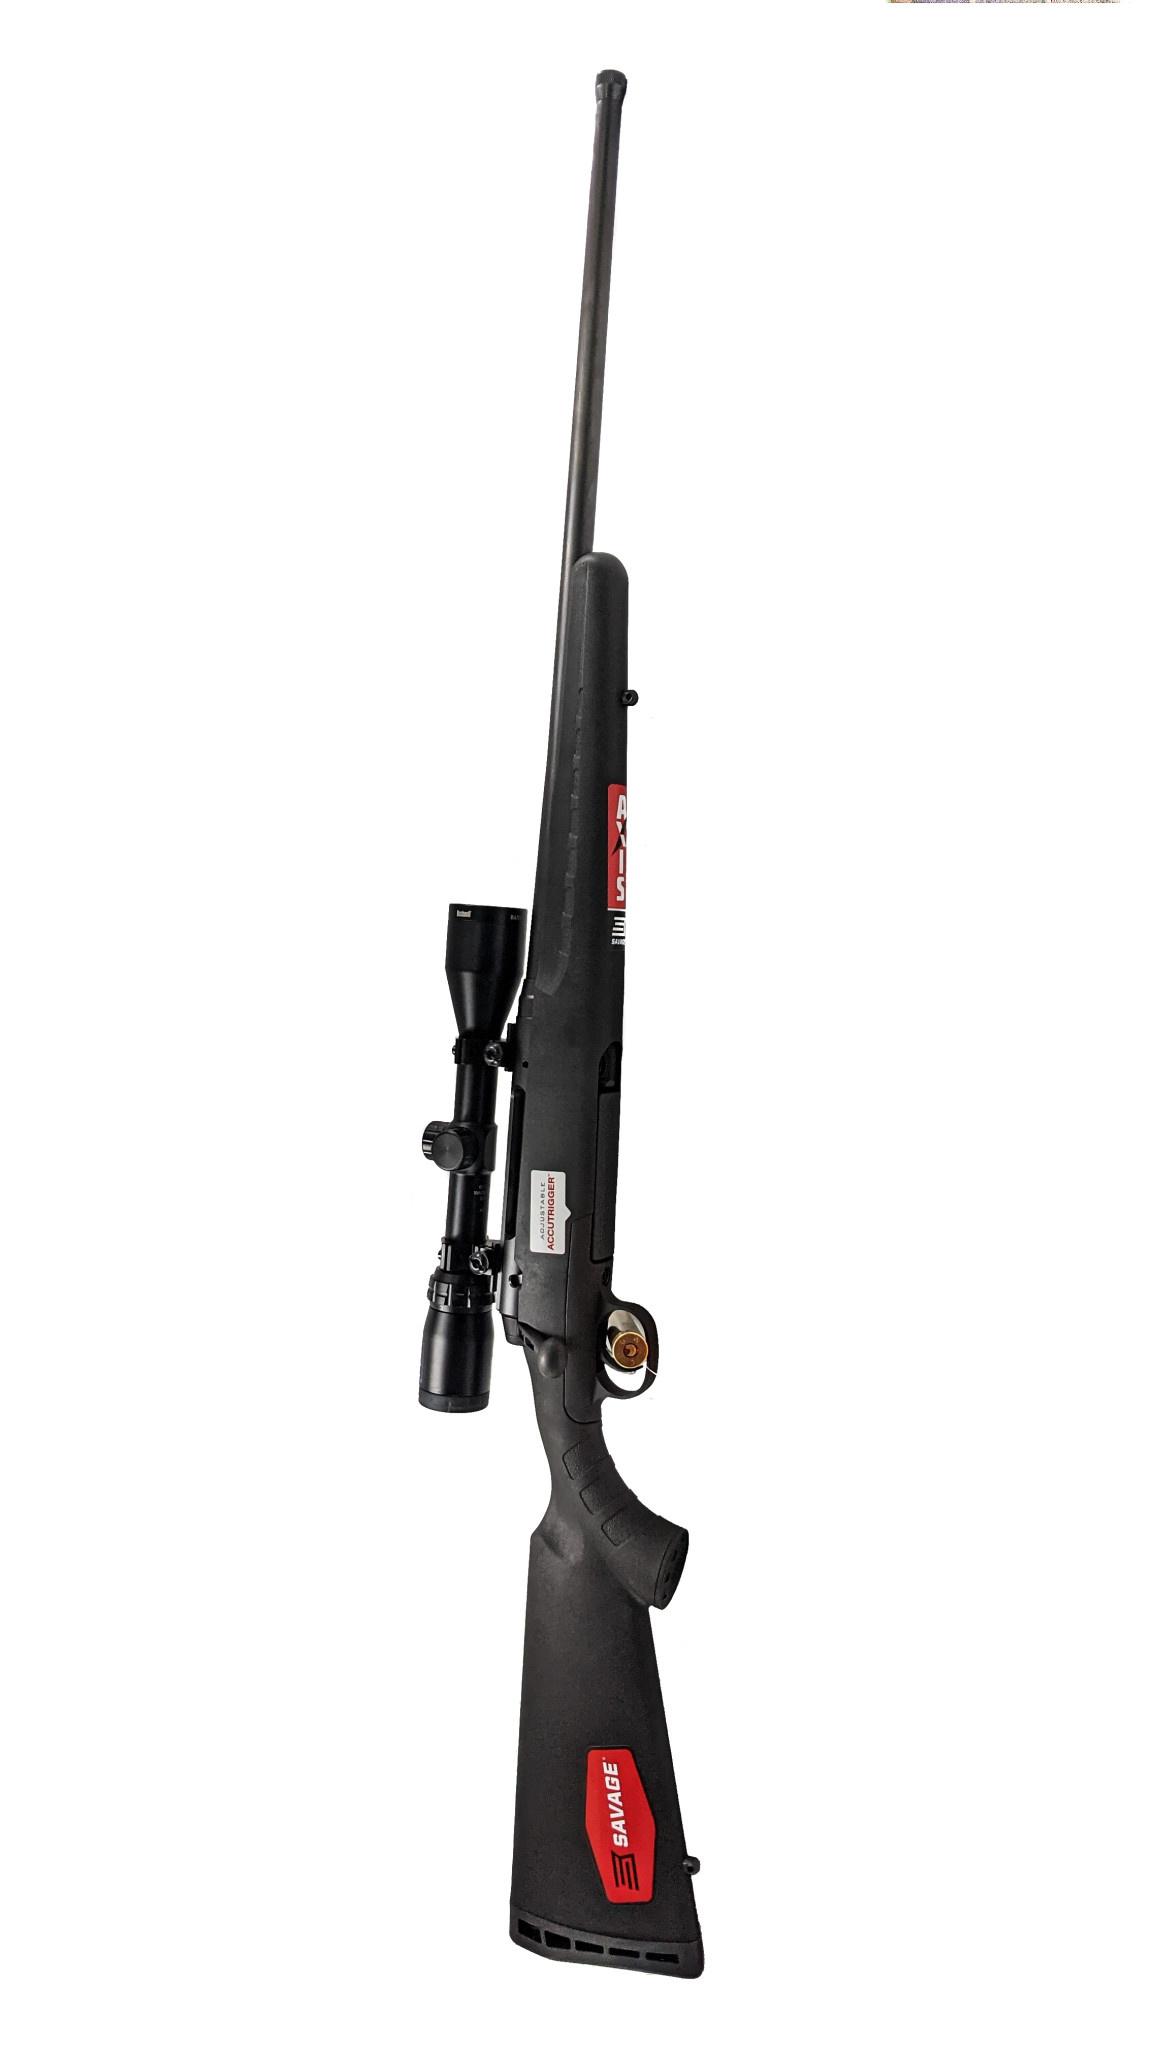 Savage Axis II XP SR 30-06 Threaded w/ Bushnell Banner 3-9x40mm scope